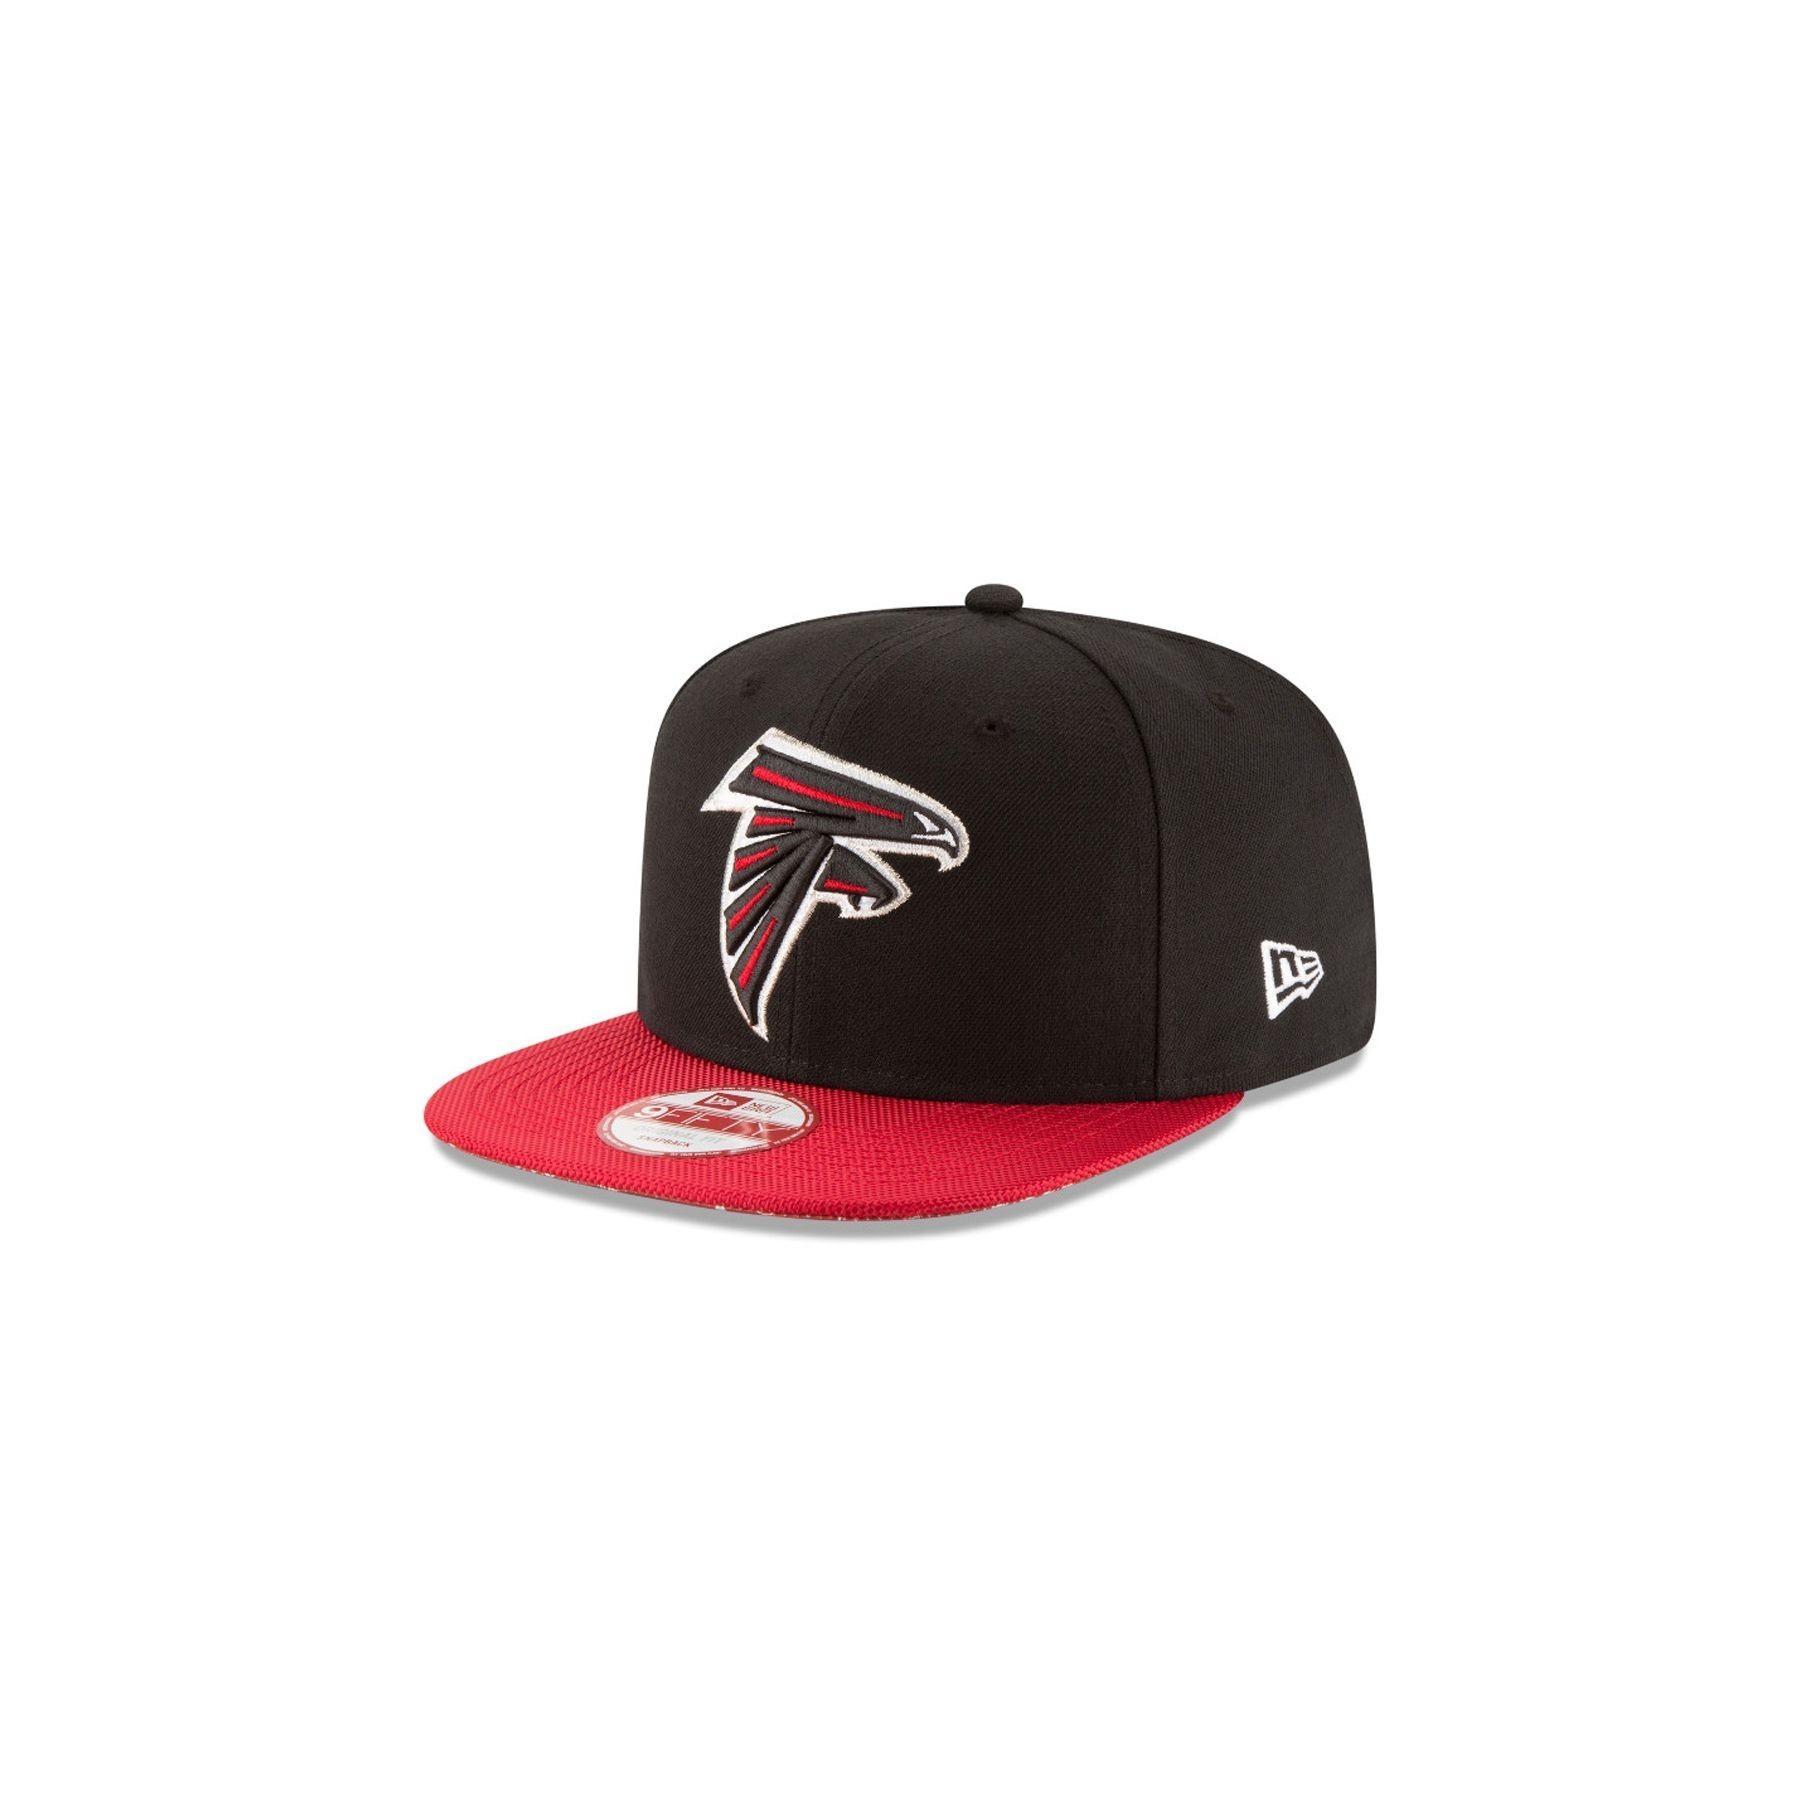 NEW ERA. CAPPELLO SNAPBACK NFL SIDELINE ATLFAL NERO ROSSO c569564c2d02